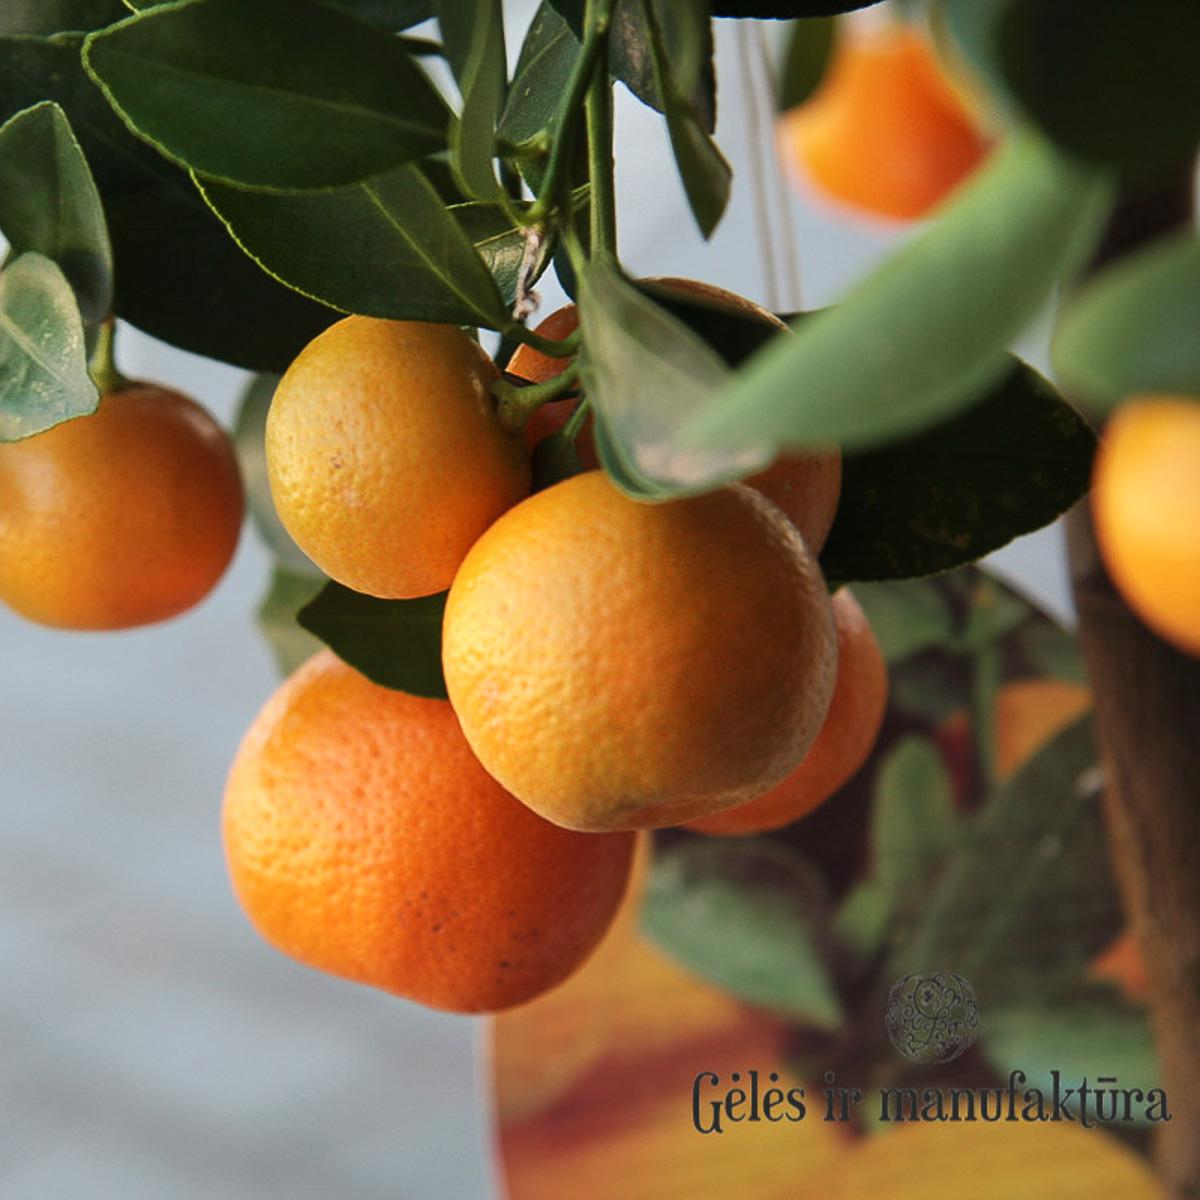 mandarinmedis citrofortunella calamondin vairi dyd i g l s ir manufakt ra. Black Bedroom Furniture Sets. Home Design Ideas